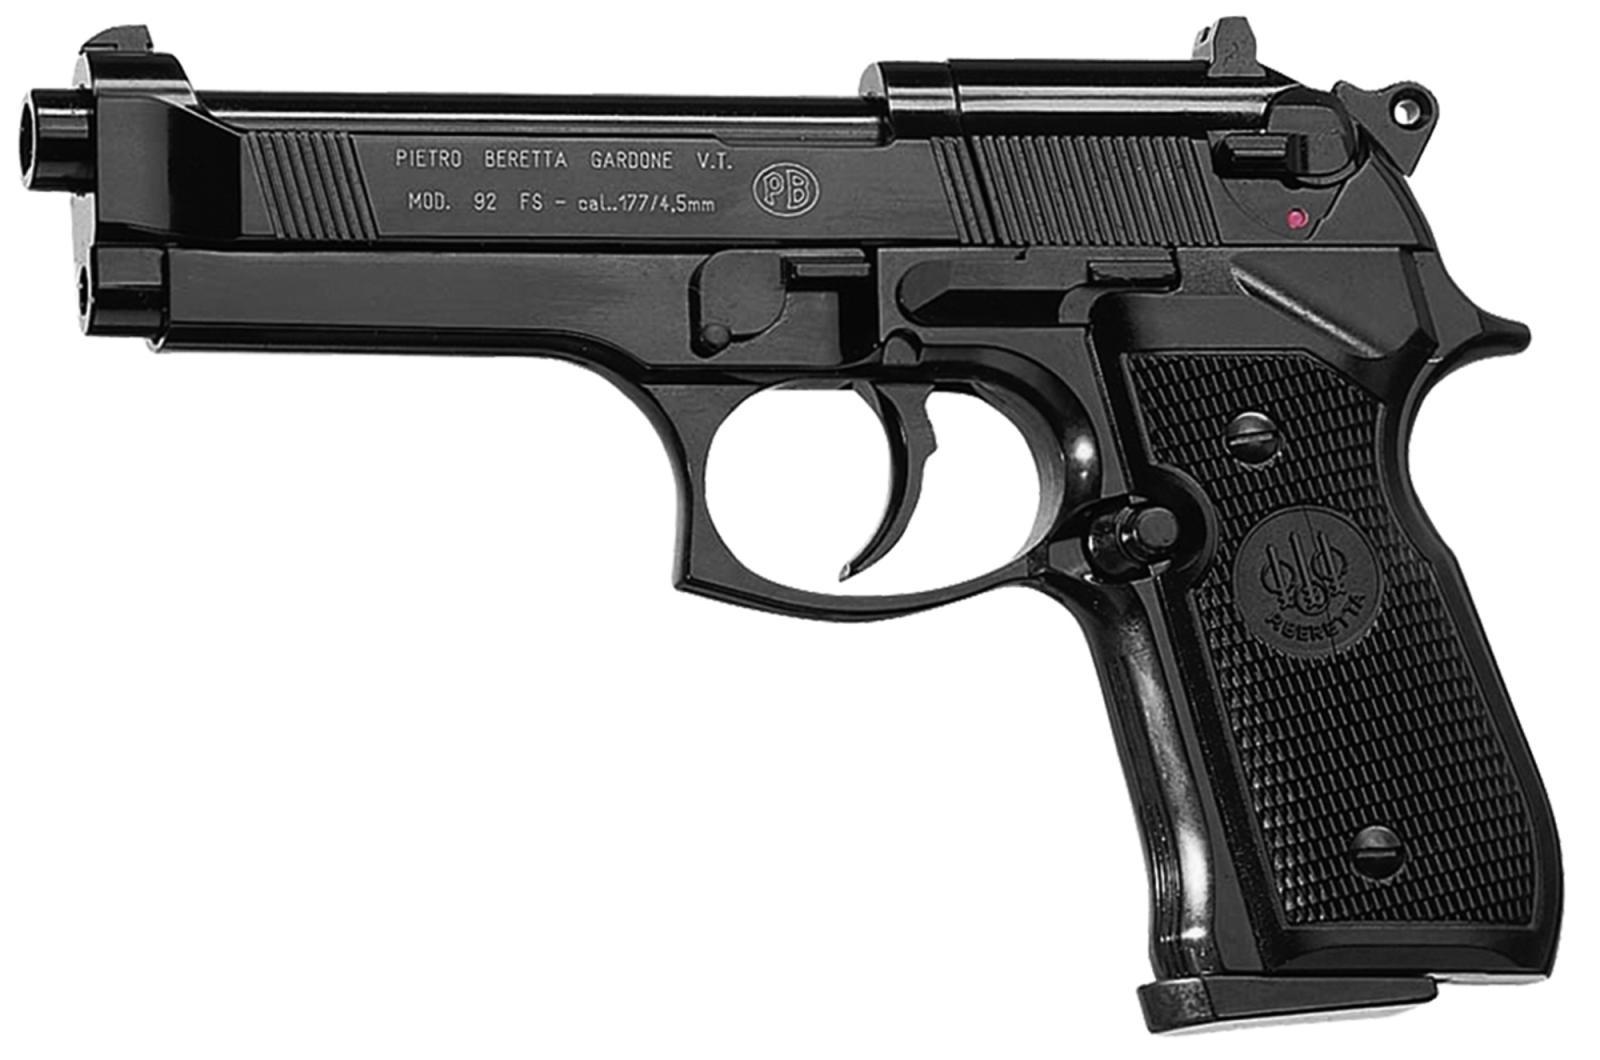 Pistolet CO2 BERETTA M92FS Full Metal Cal. 4.5 mm